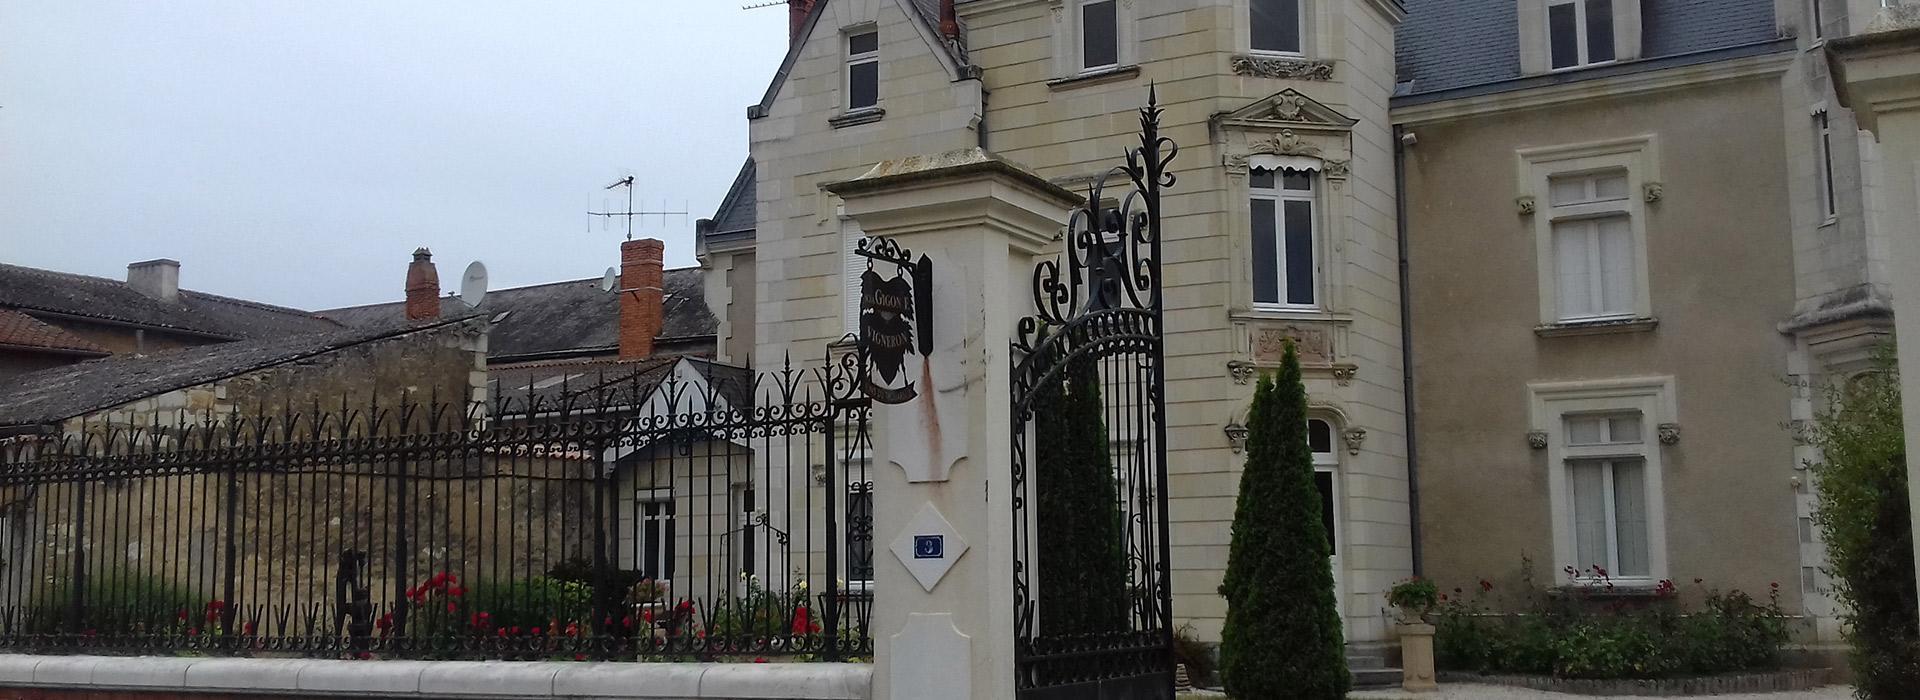 Domaine viticole 79